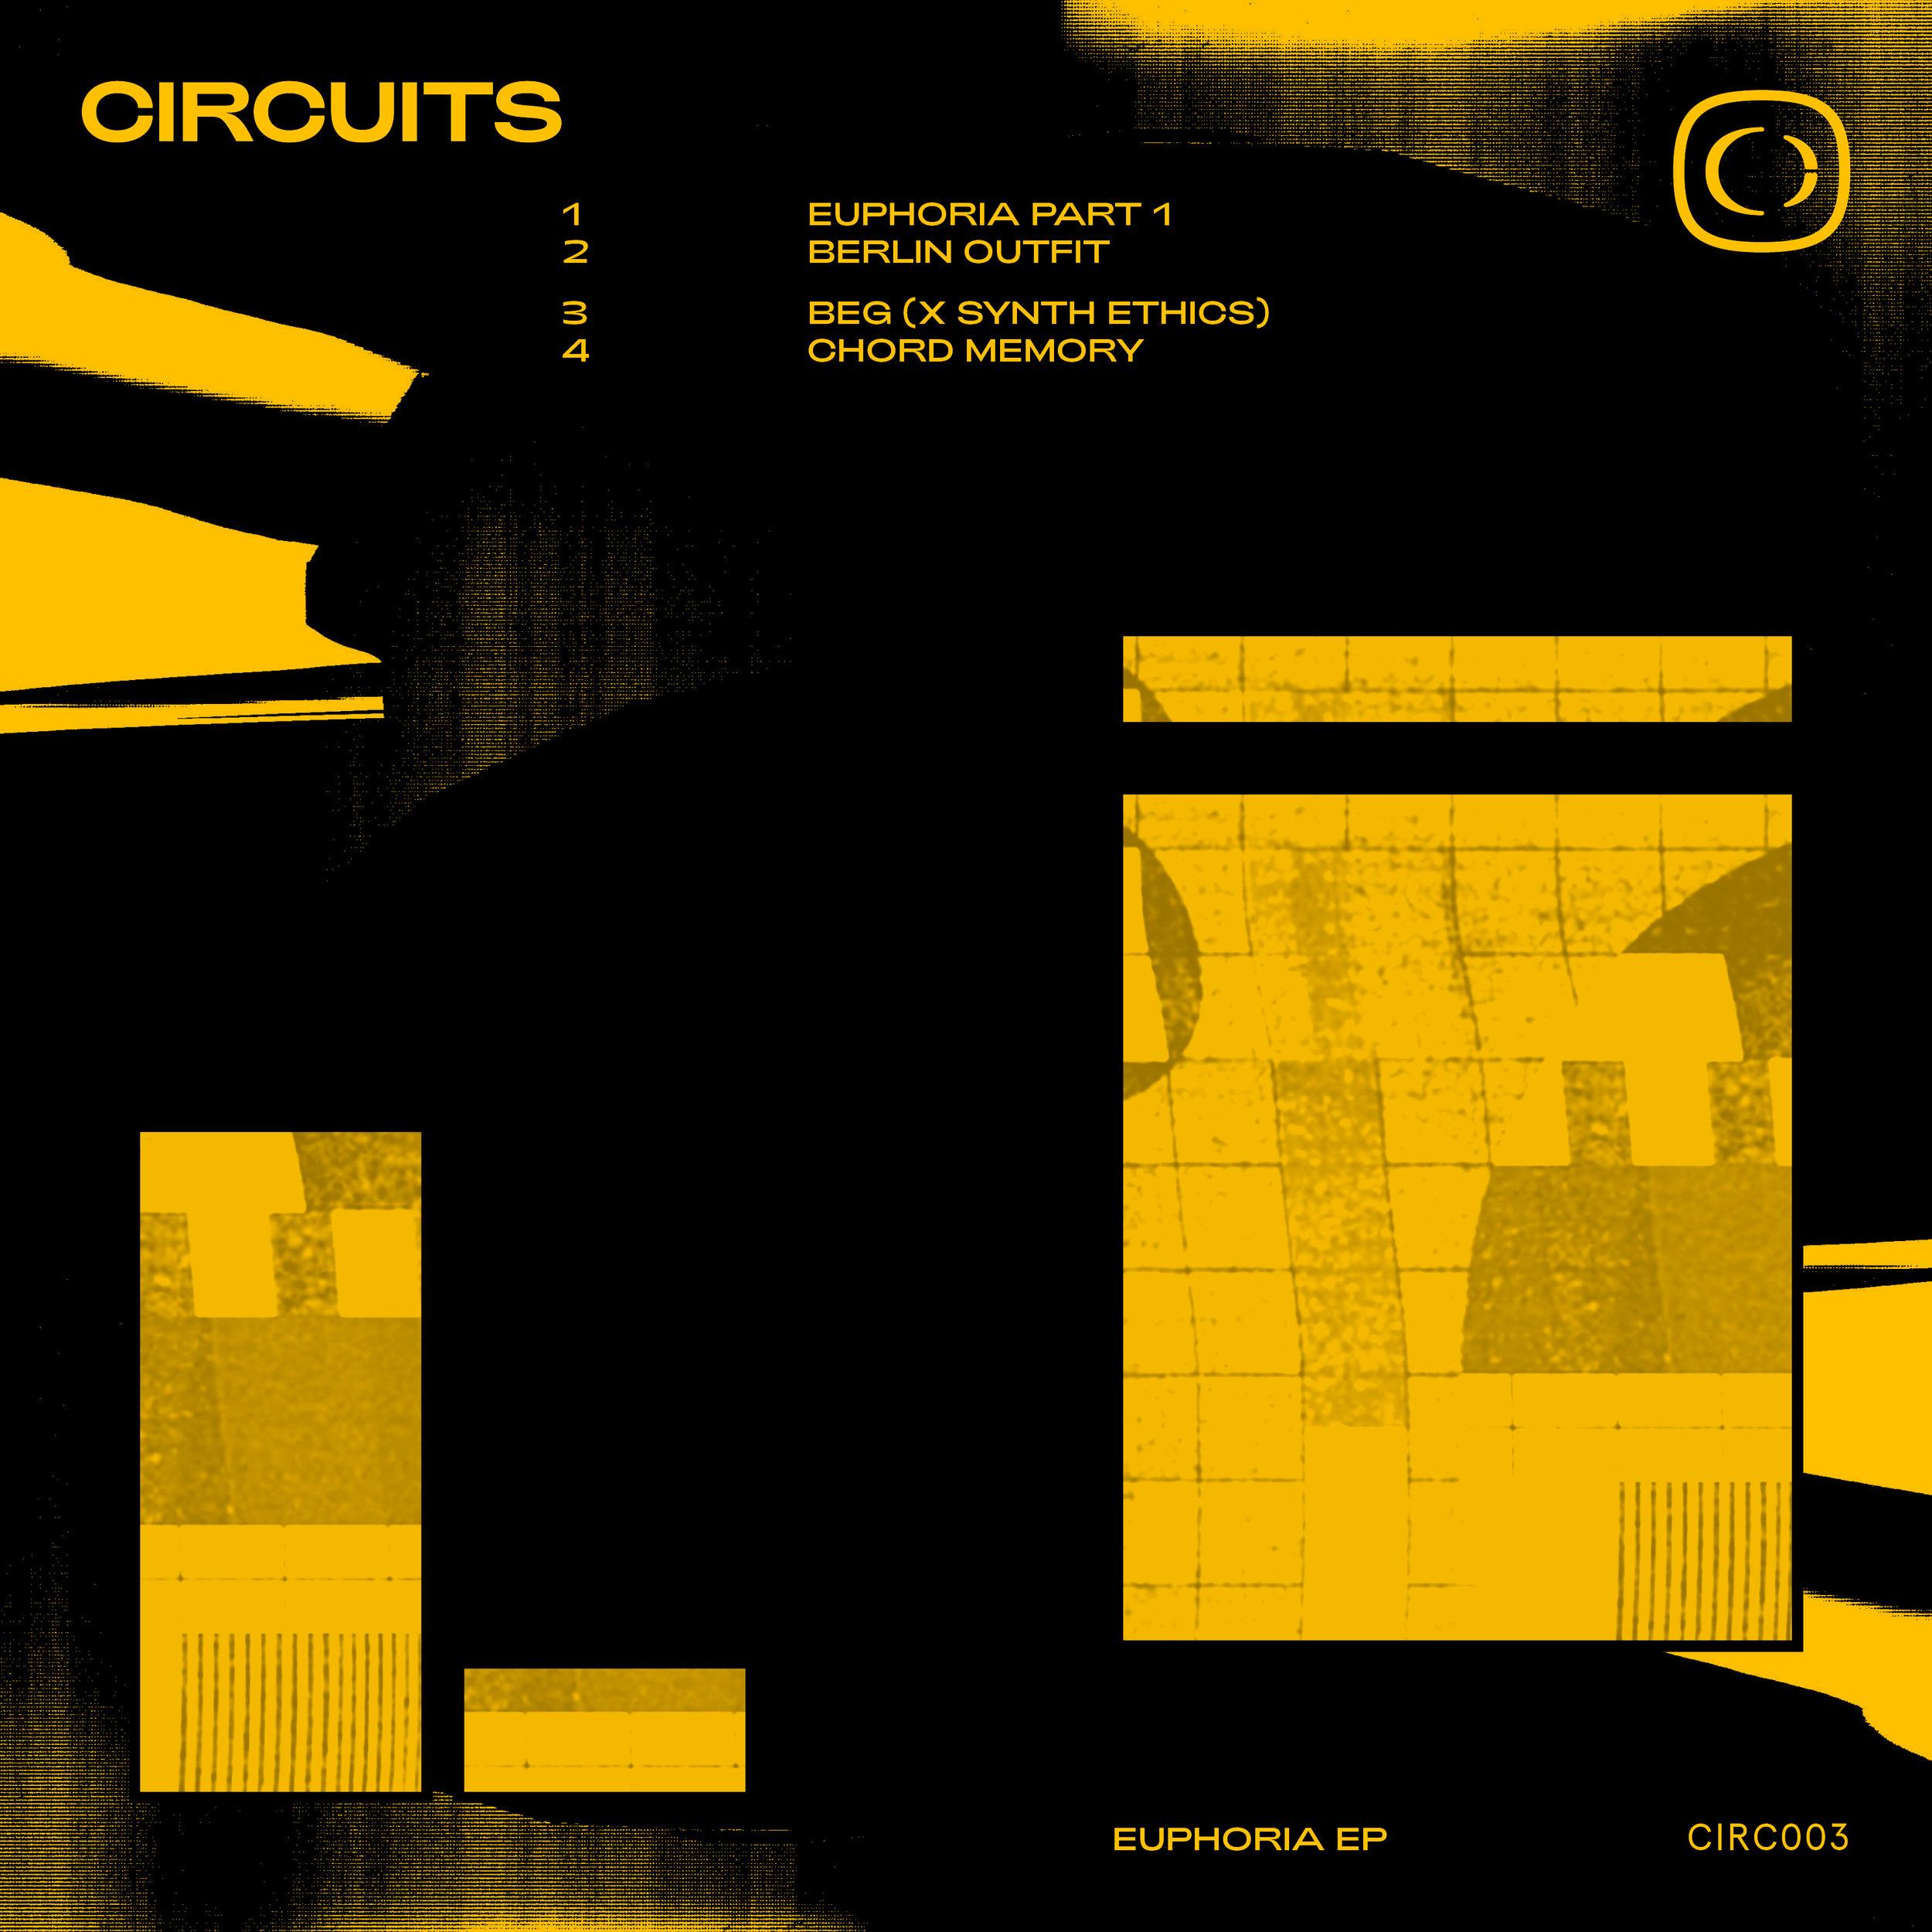 Circuits - Euphoria EP